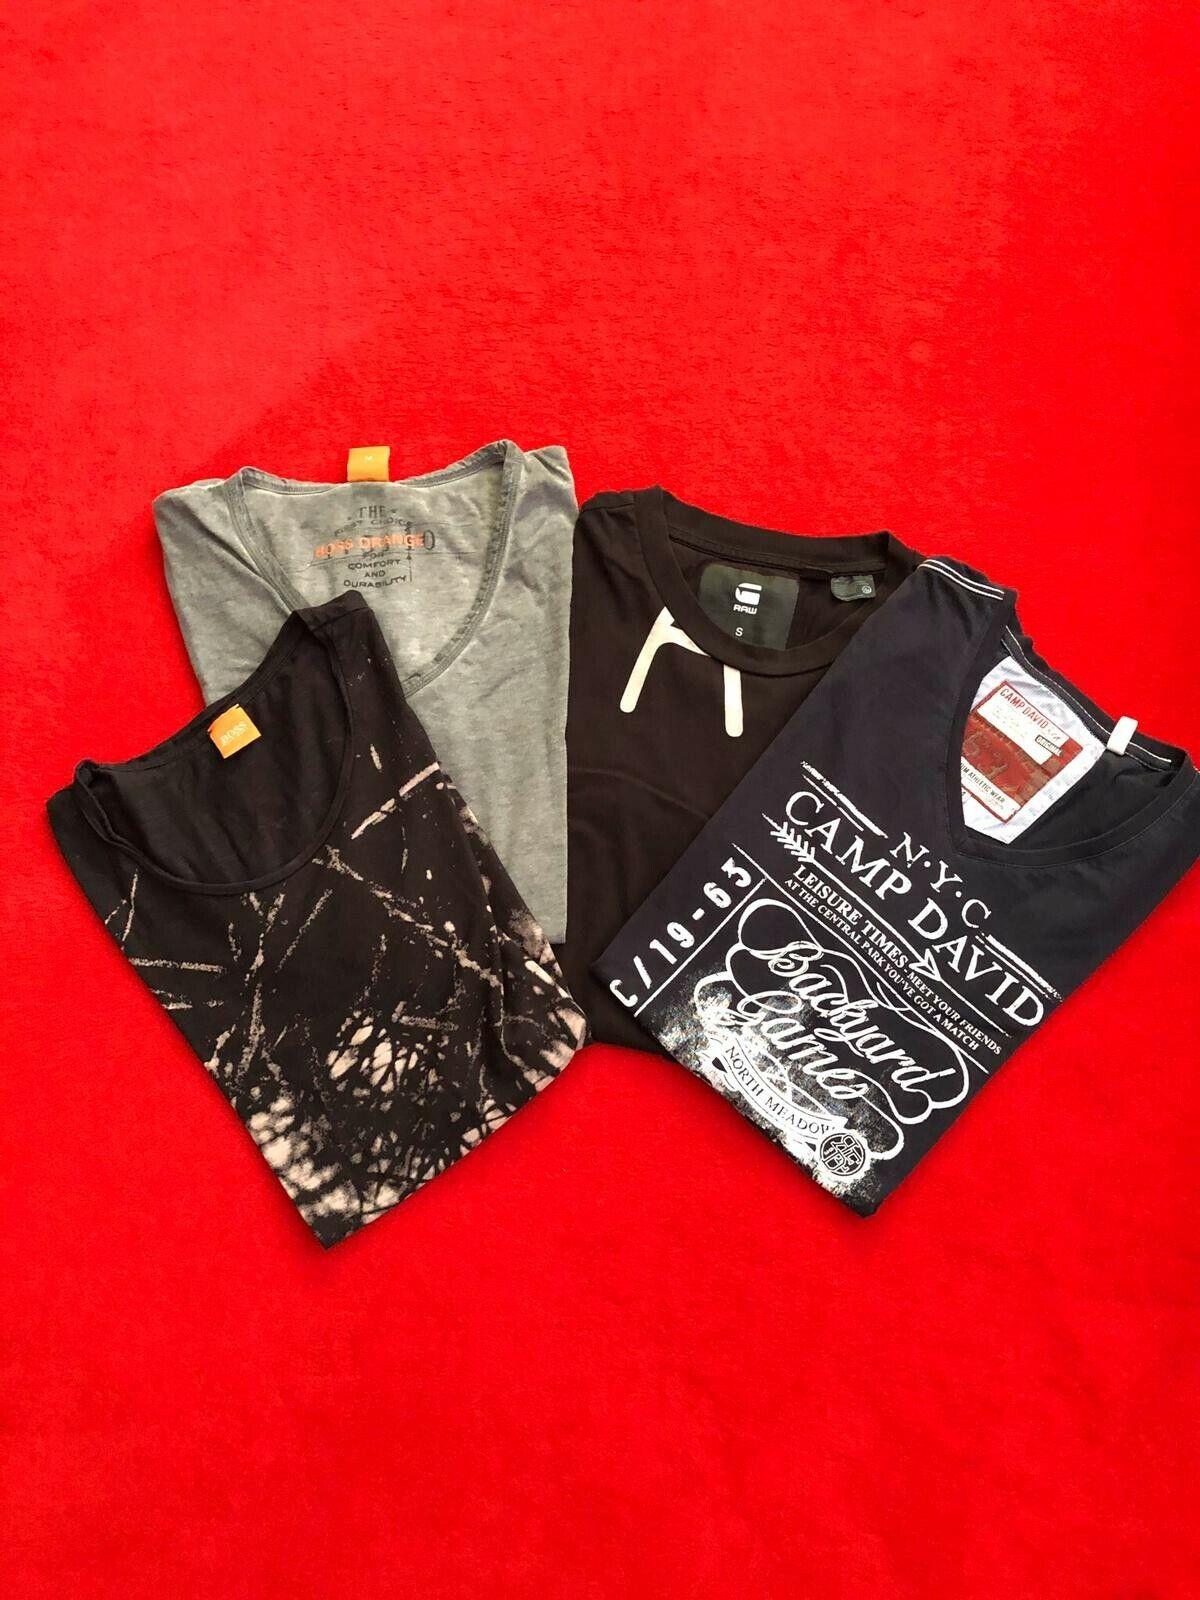 Kleiderpaket T-Shirts BOSS CAMP DAVID GSTAR RAW M S